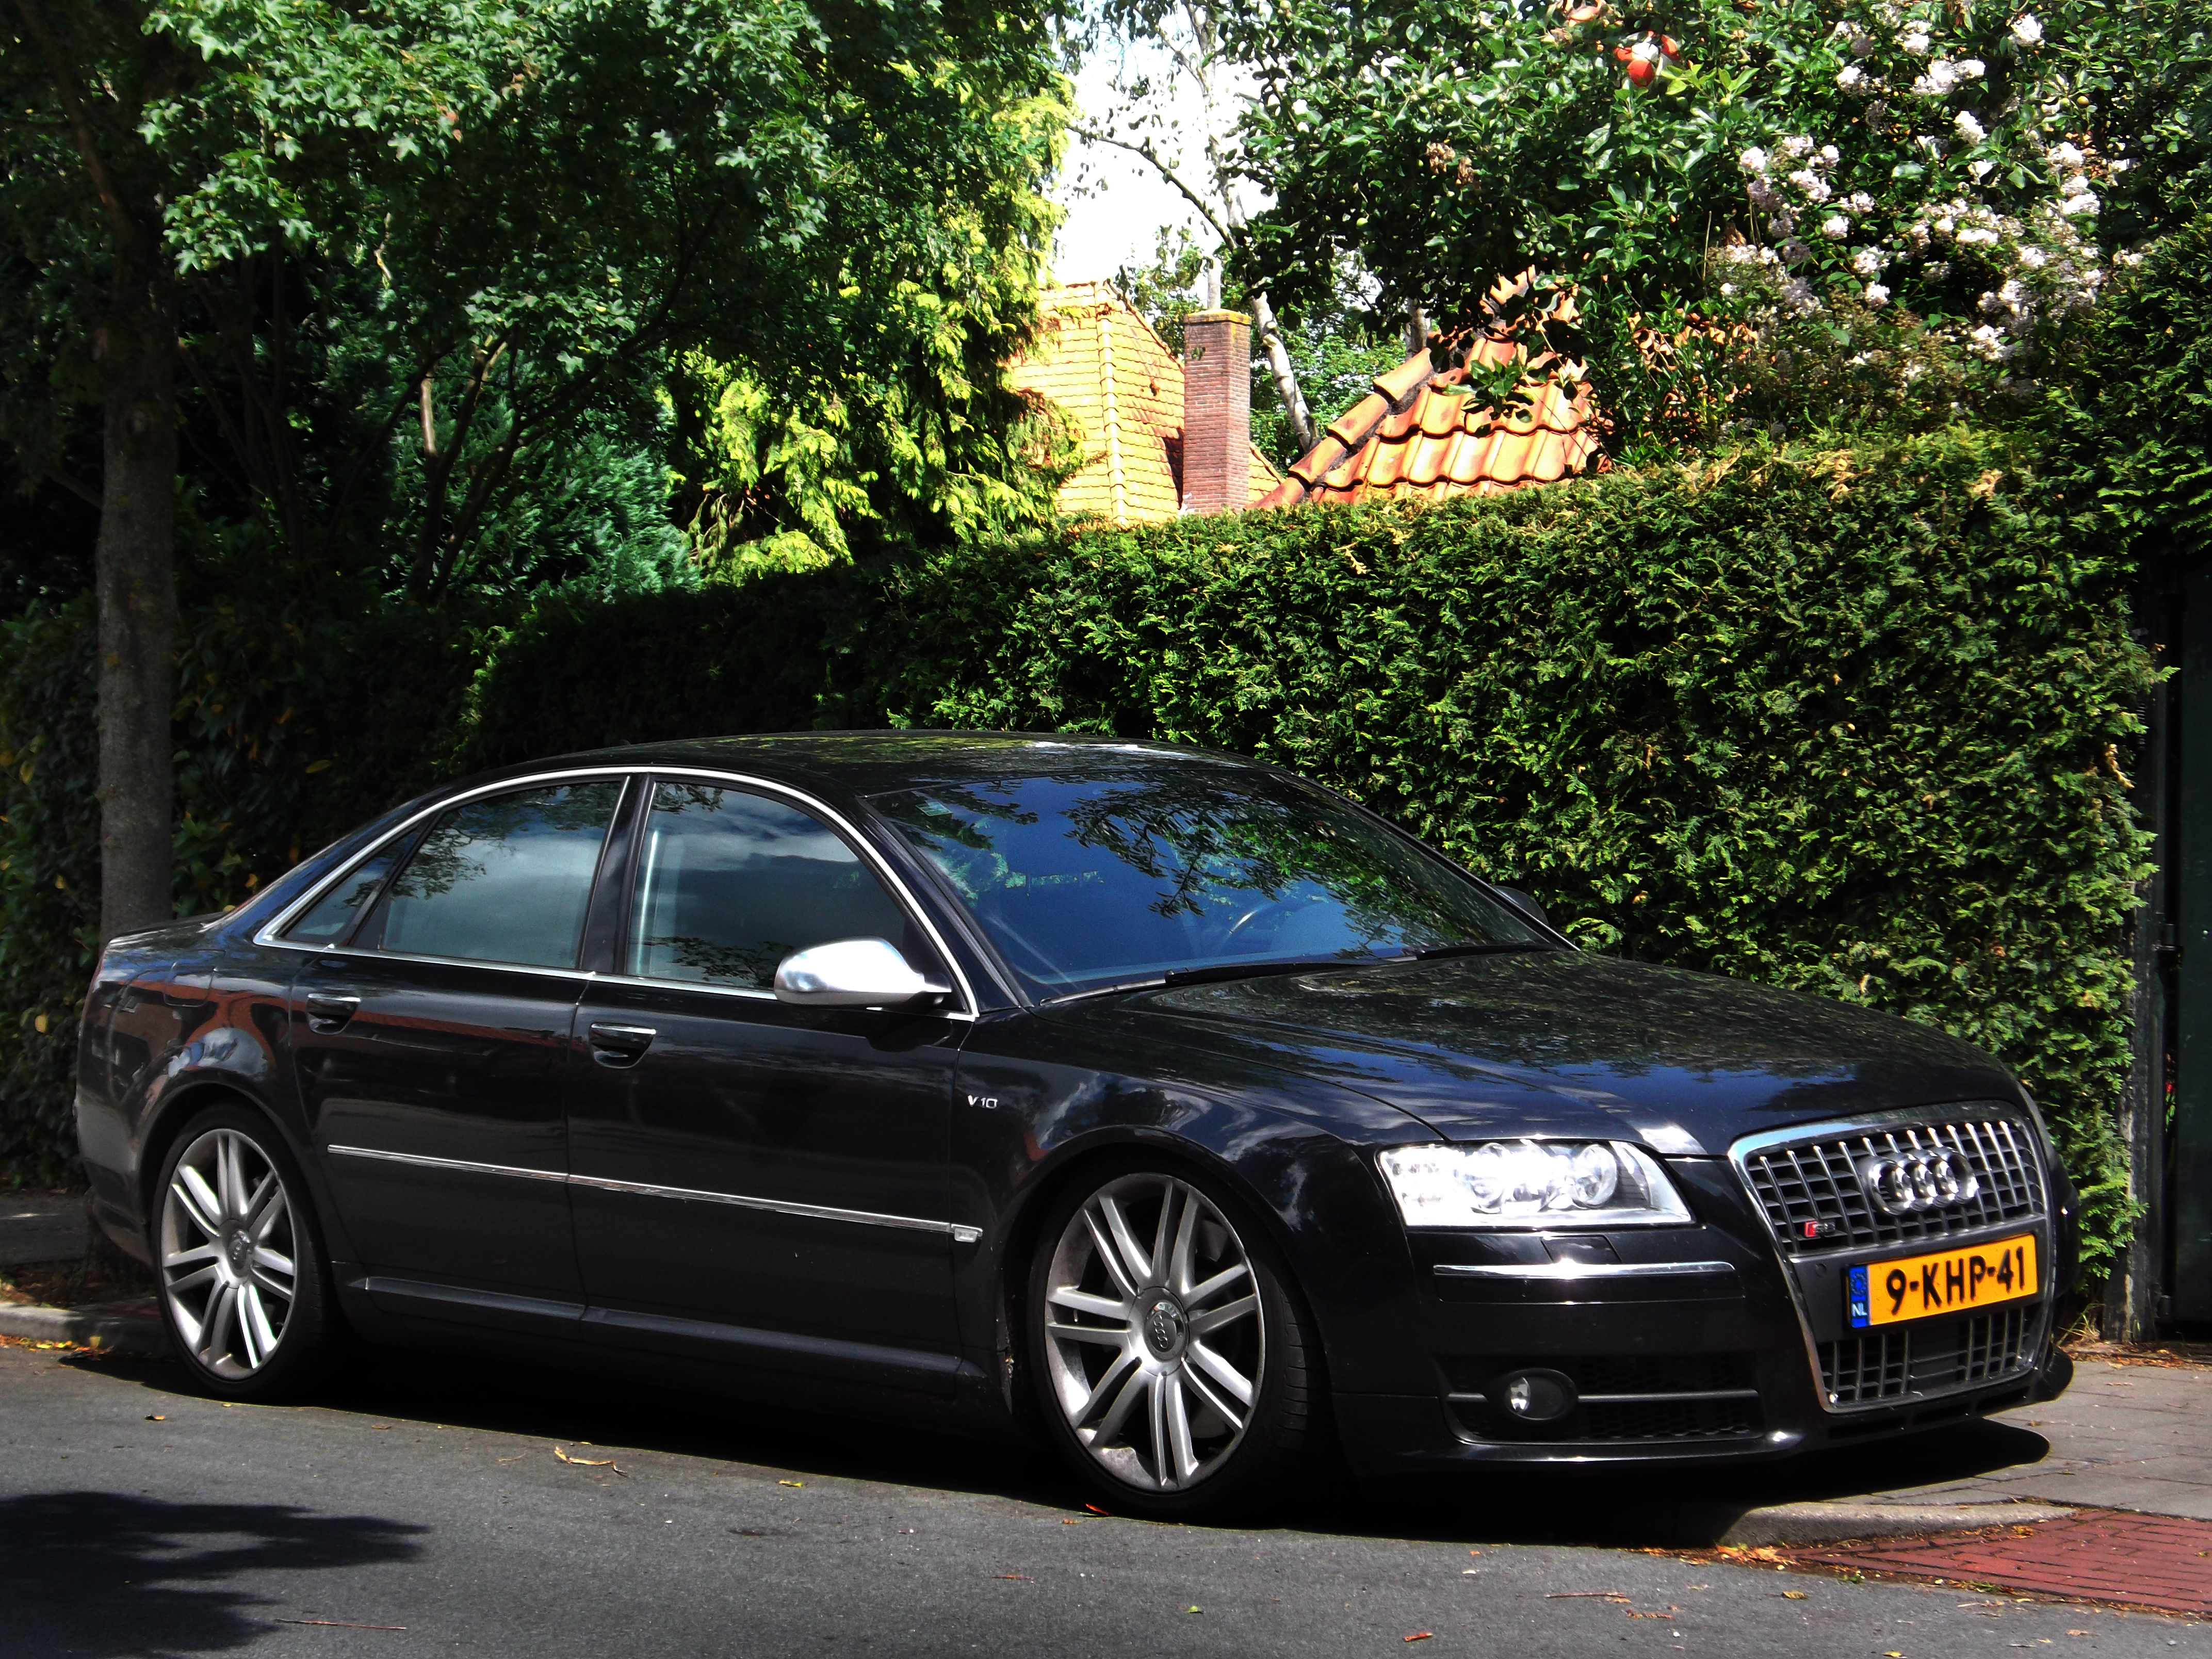 File:Audi S8 (9132794291).jpg - Wikimedia Commons